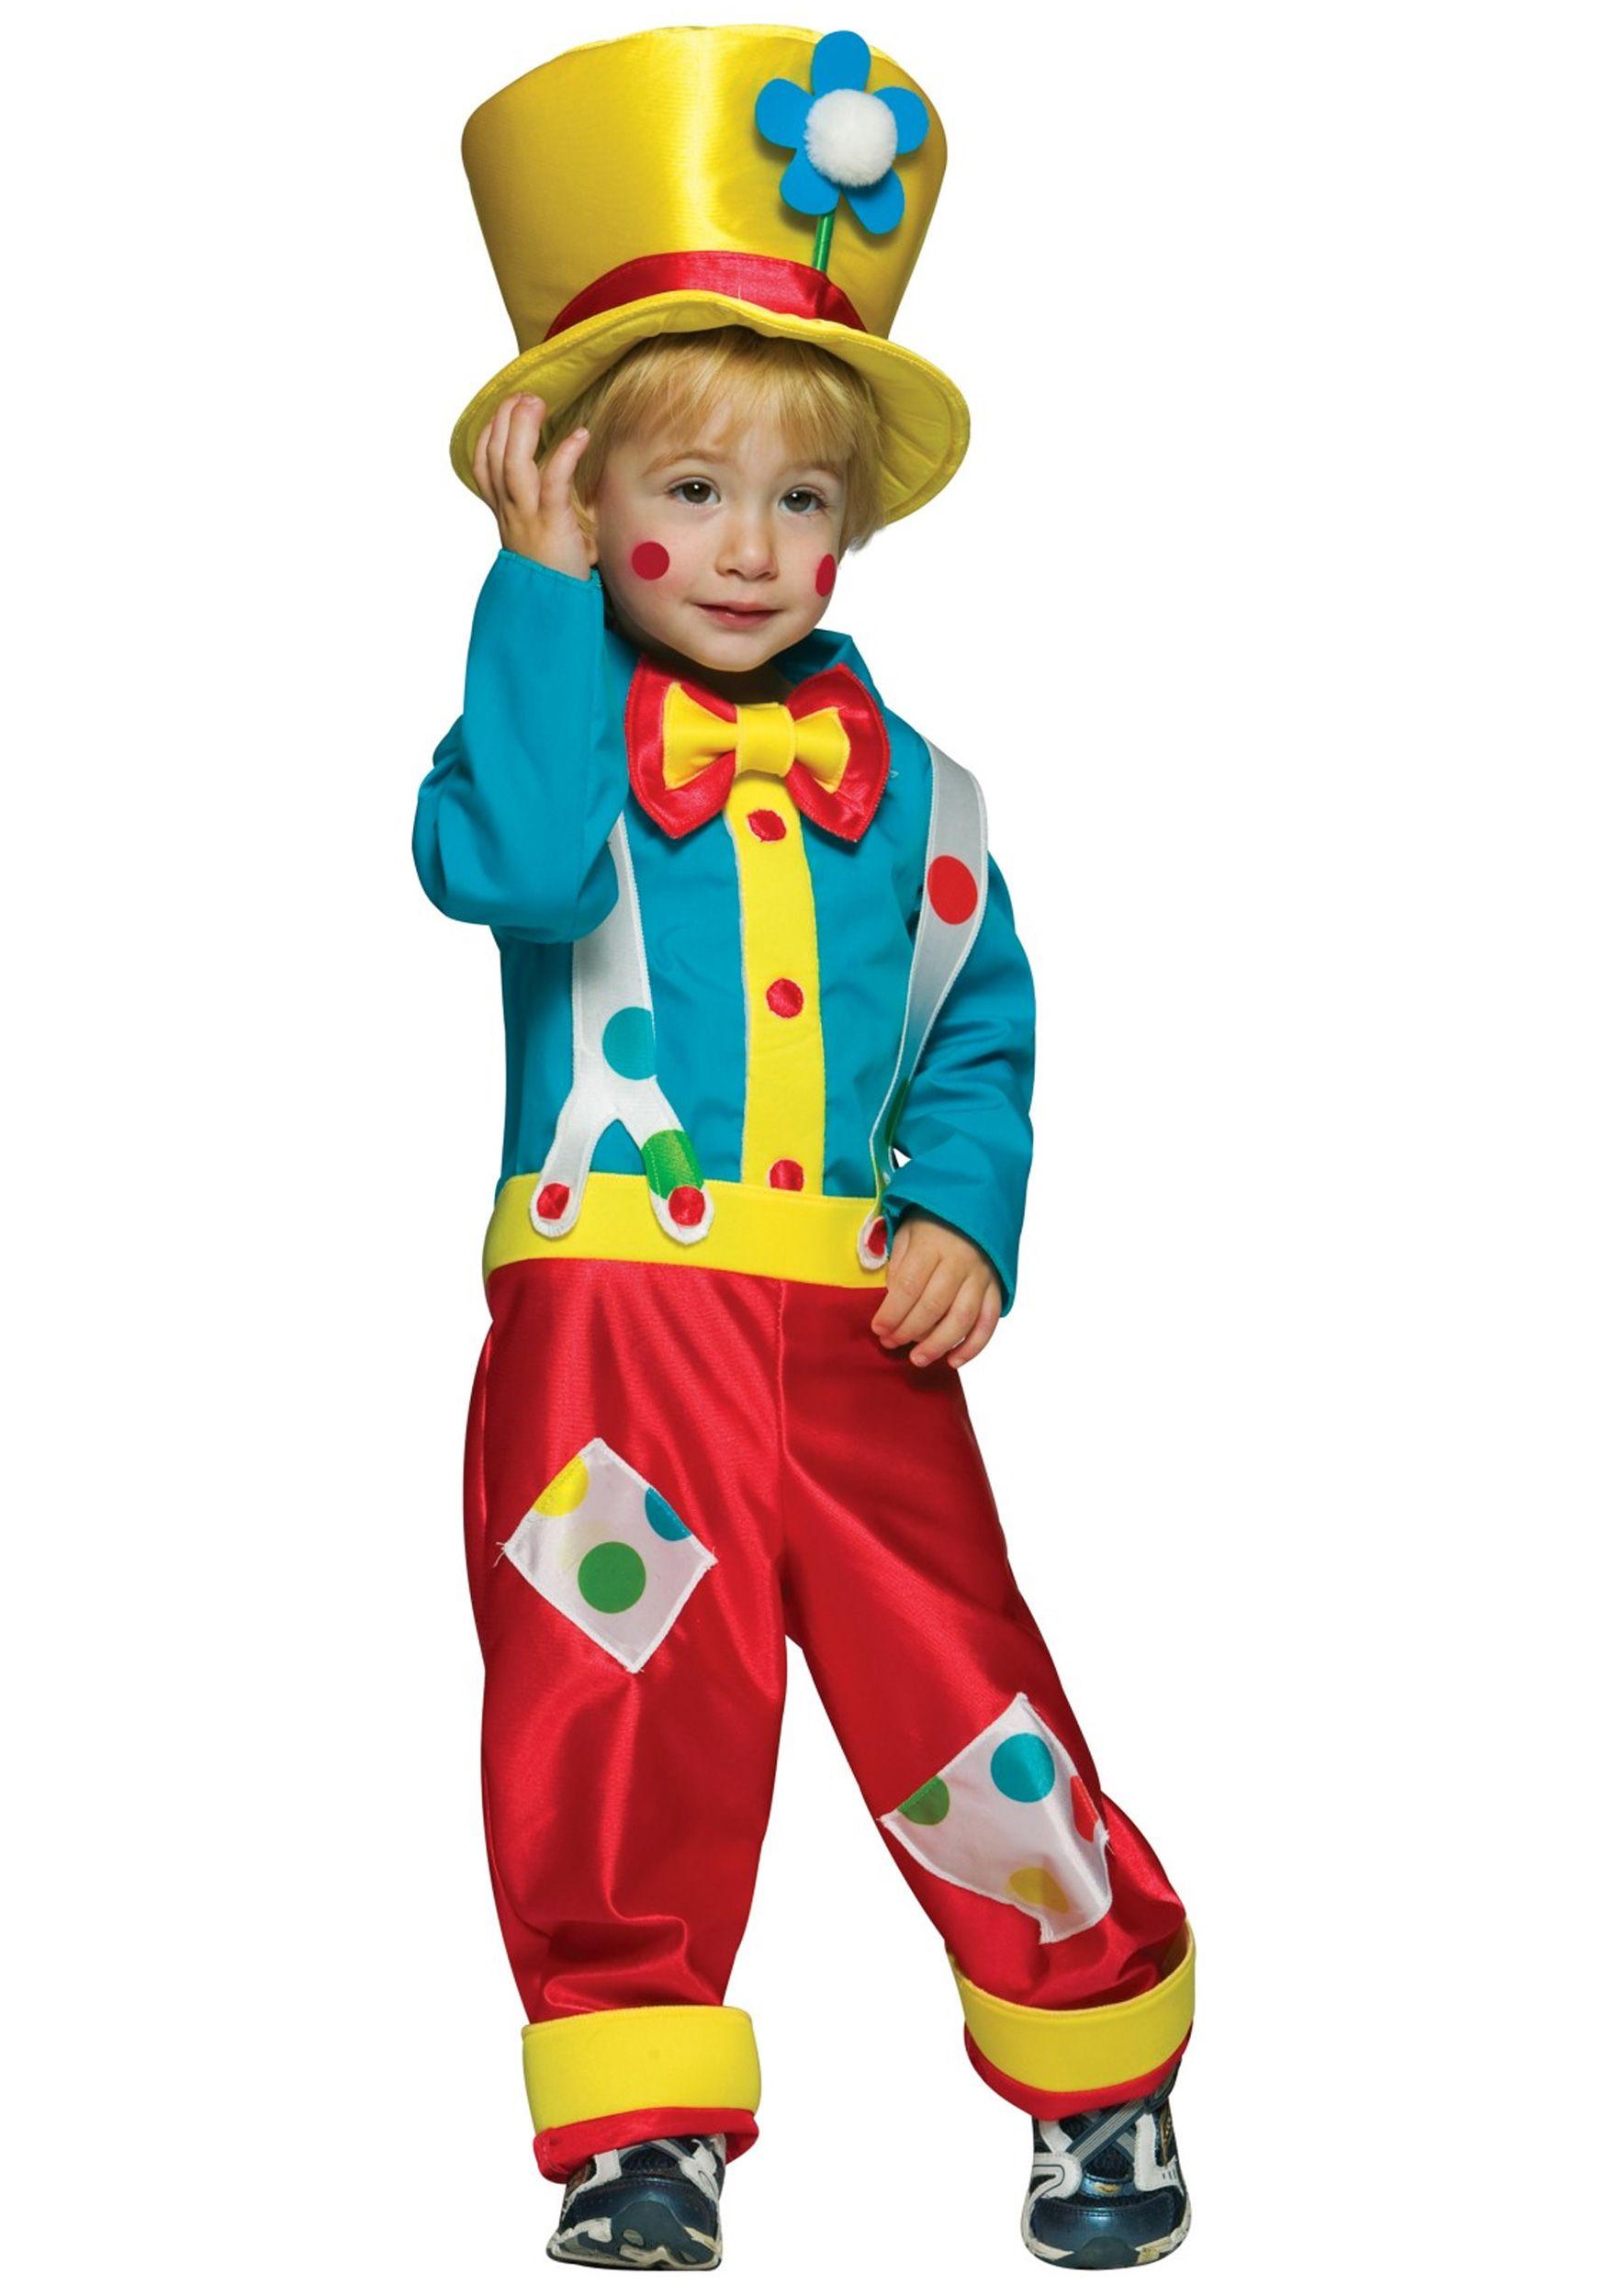 happy halloween toddler boys clown costume 2399 - Mad Hatter Halloween Costume For Kids